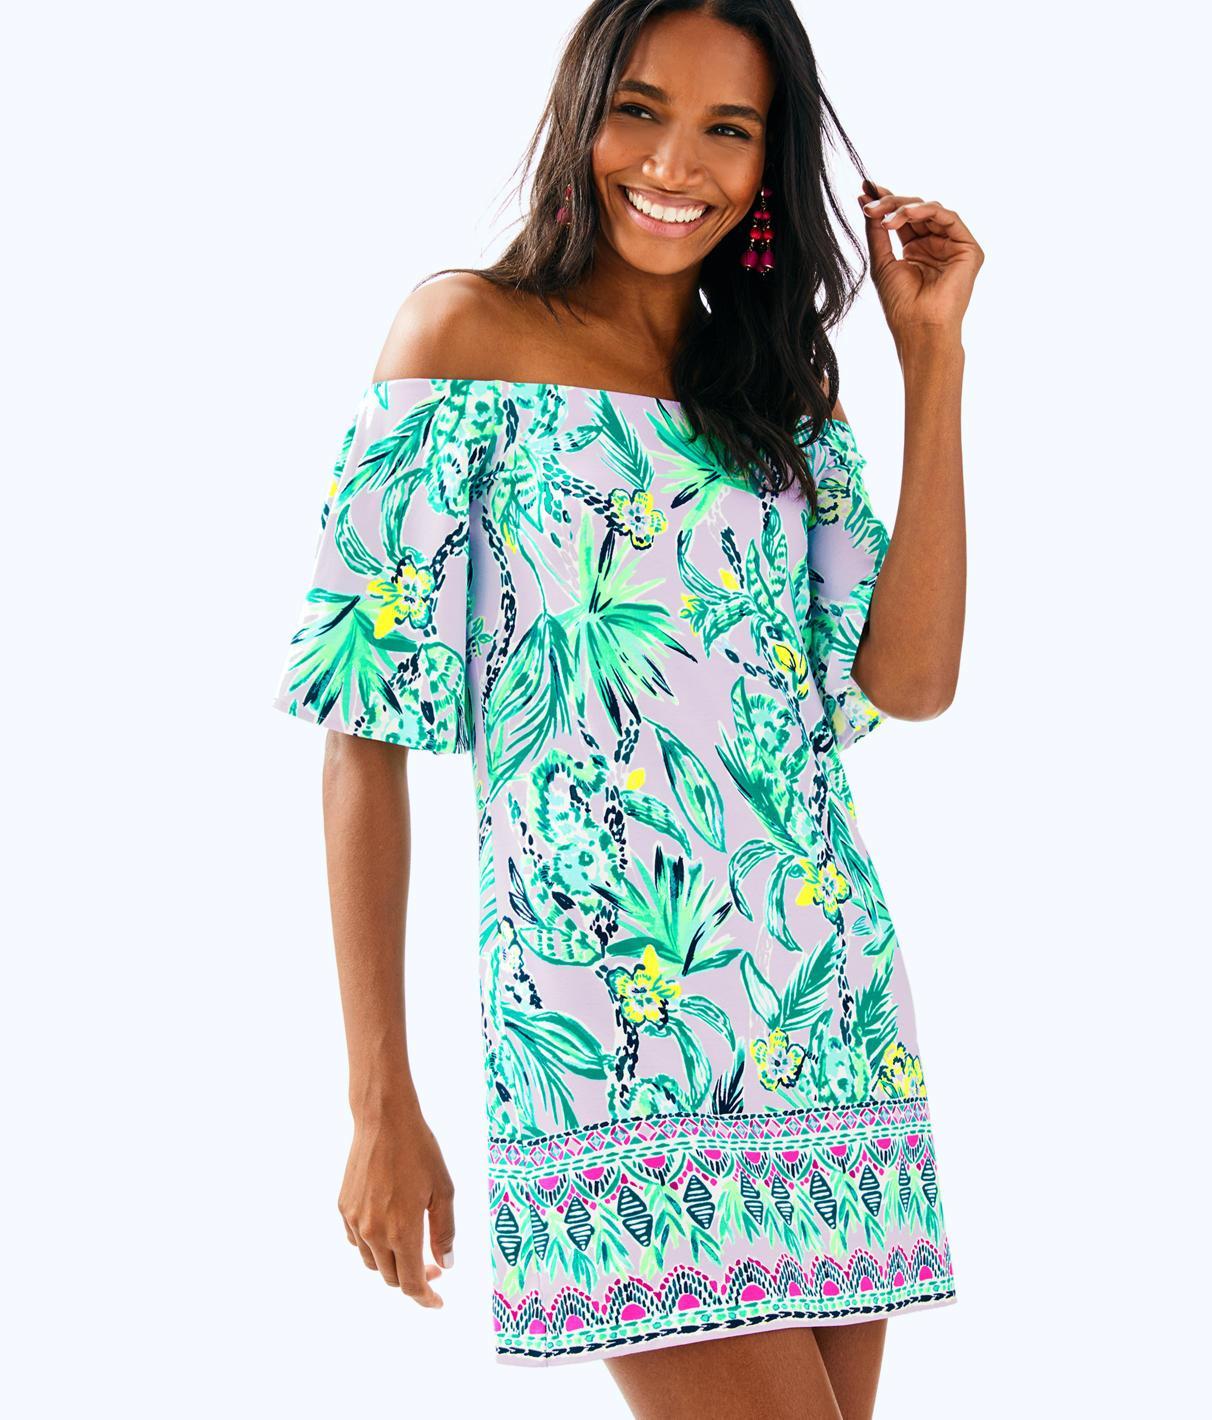 573231dda56b9d Lilly Pulitzer Fawcett Off The Shoulder Dress In Light Lilac Verbena Its  Impawsible Eng Knit Dress